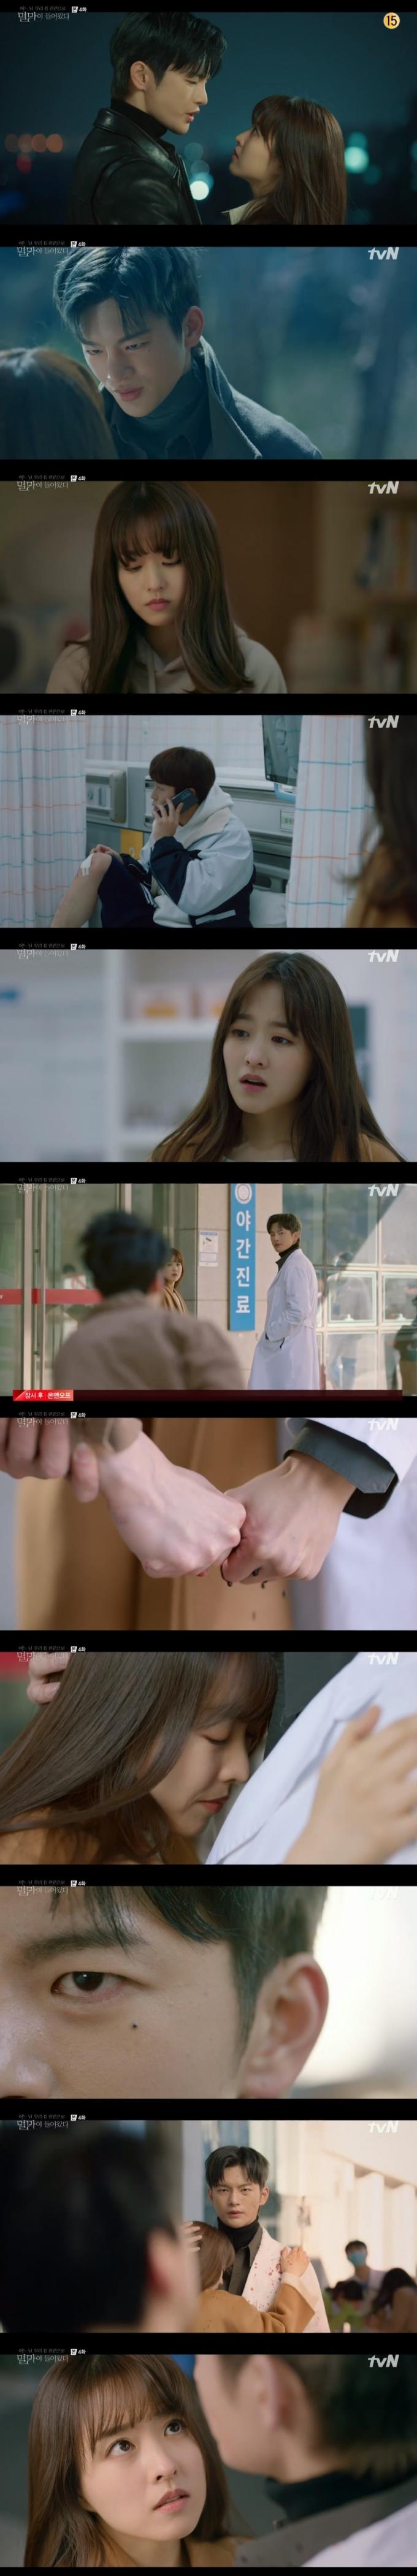 tvN '어느 날 우리집 현관으로 멸망이 들어왔다' 캡처 © 뉴스1